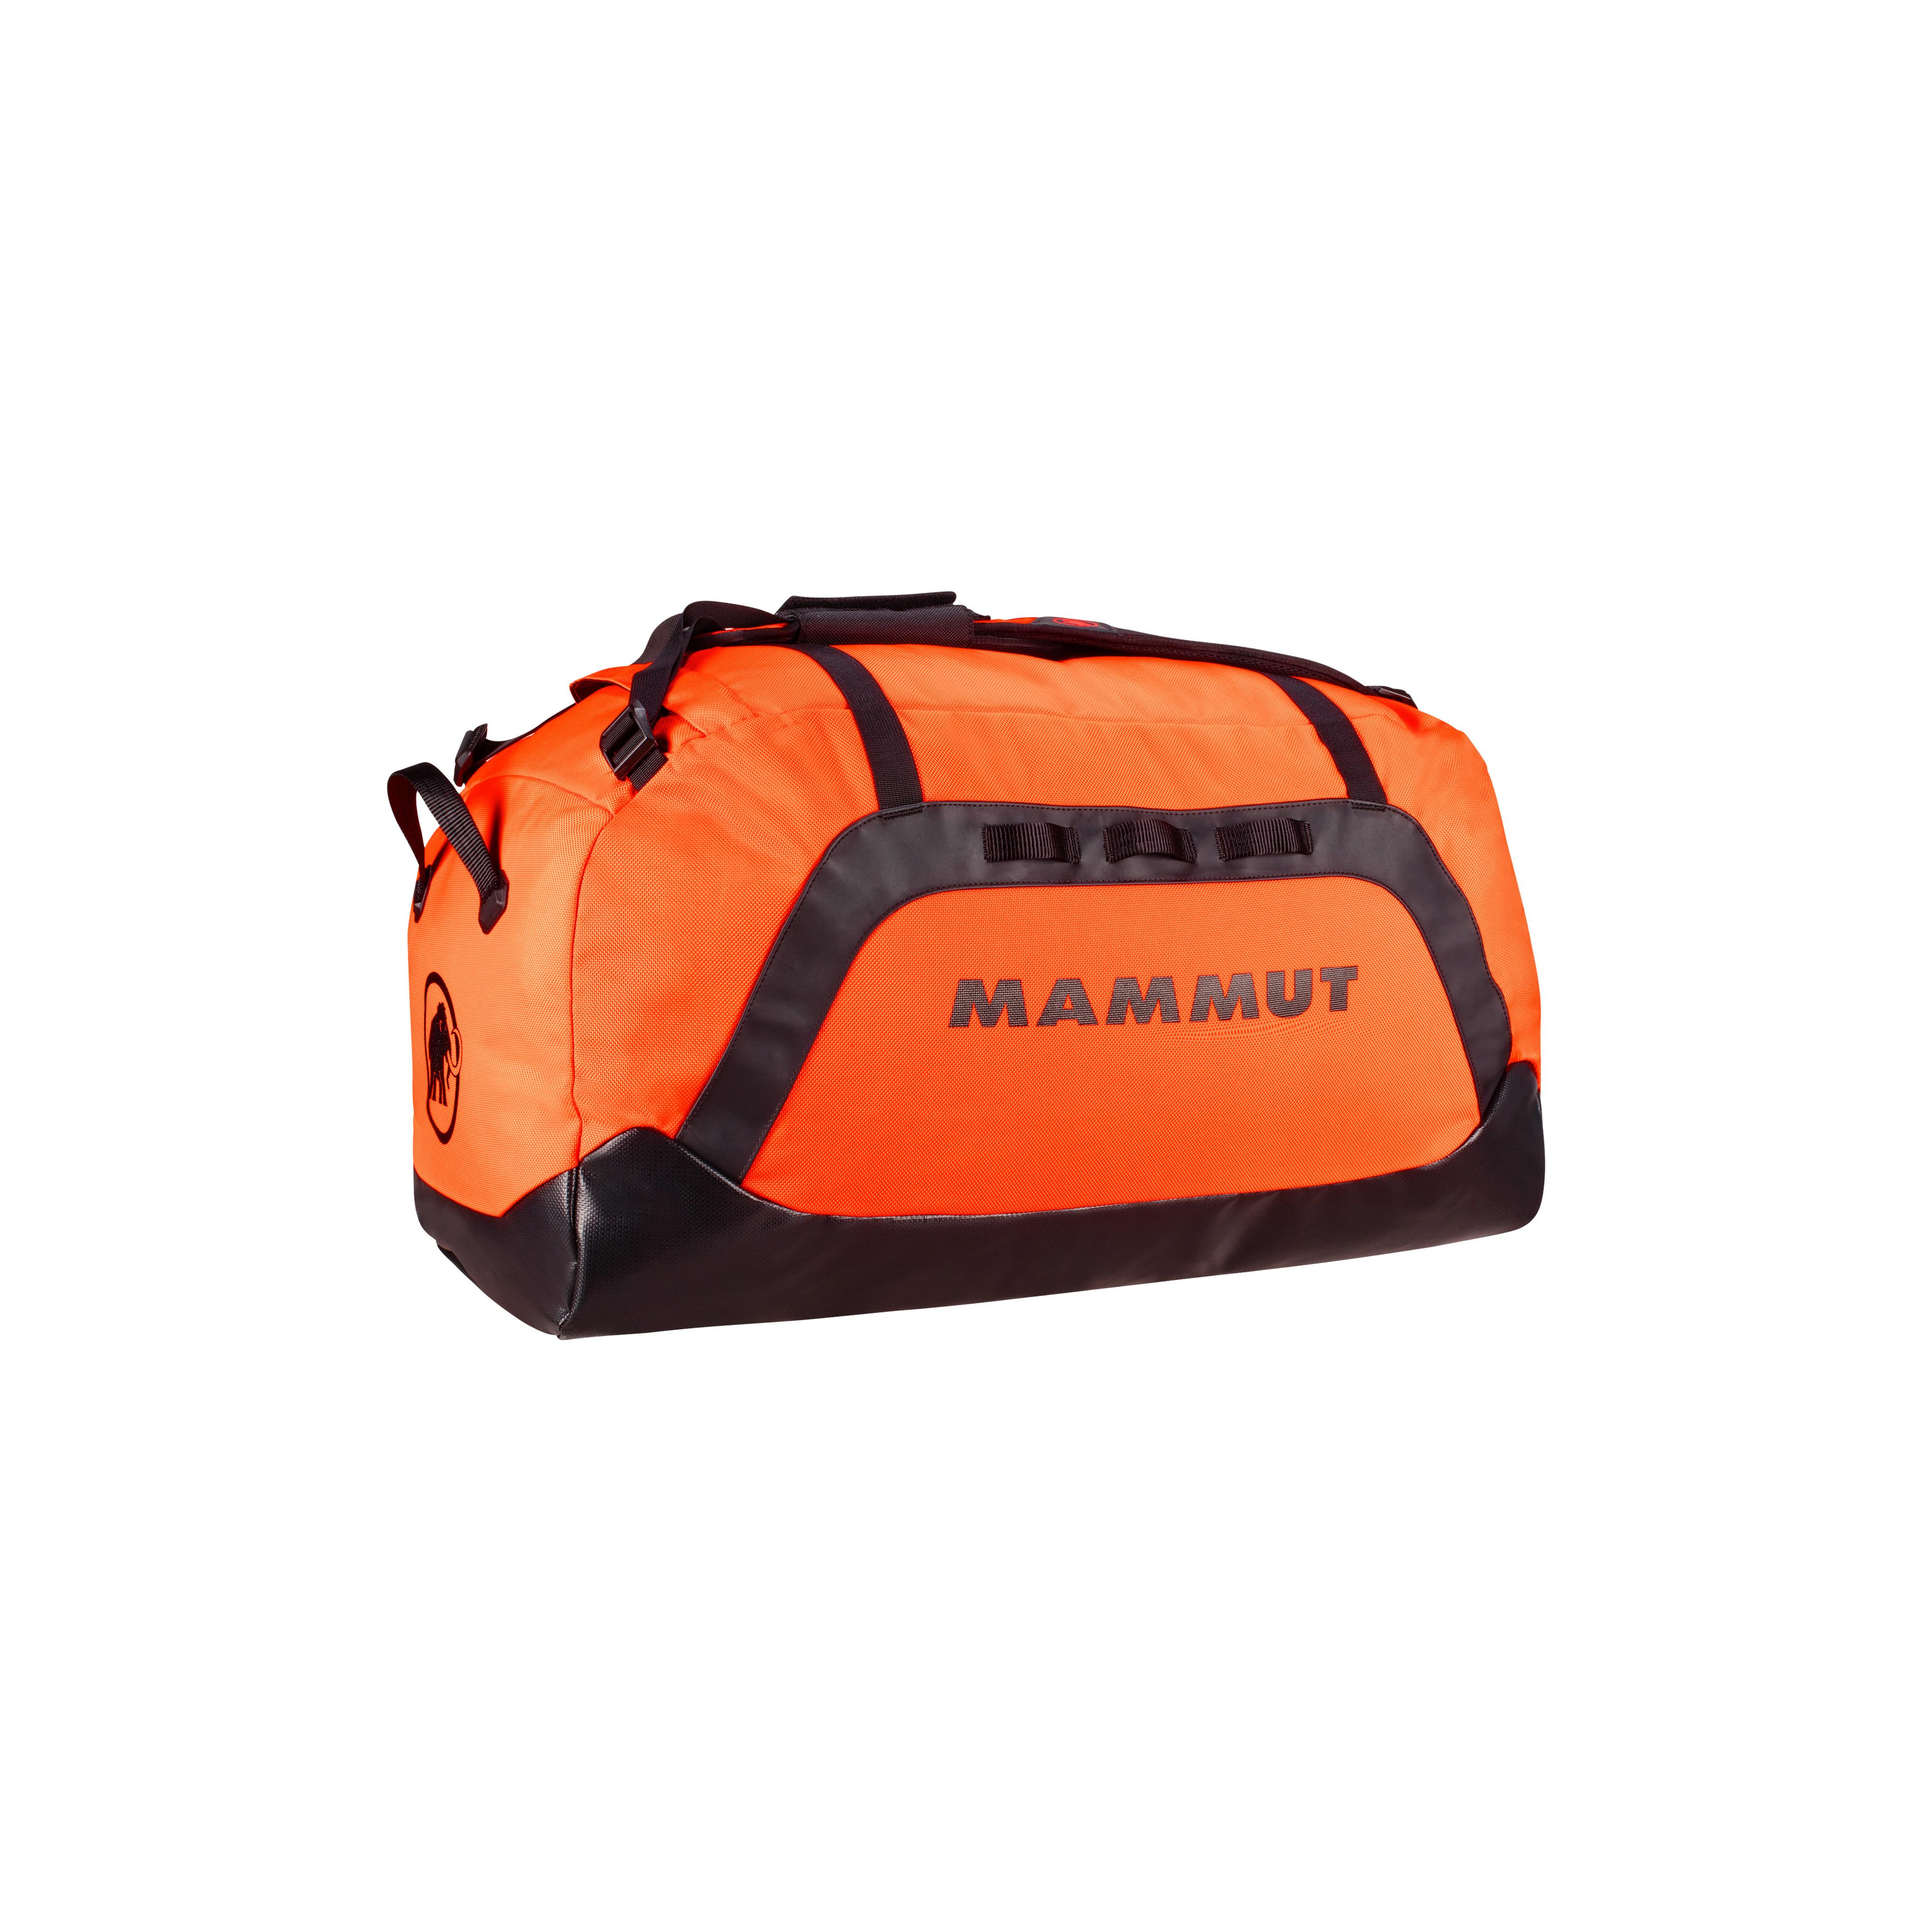 Cargon - 40 L, safety orange-black thumbnail